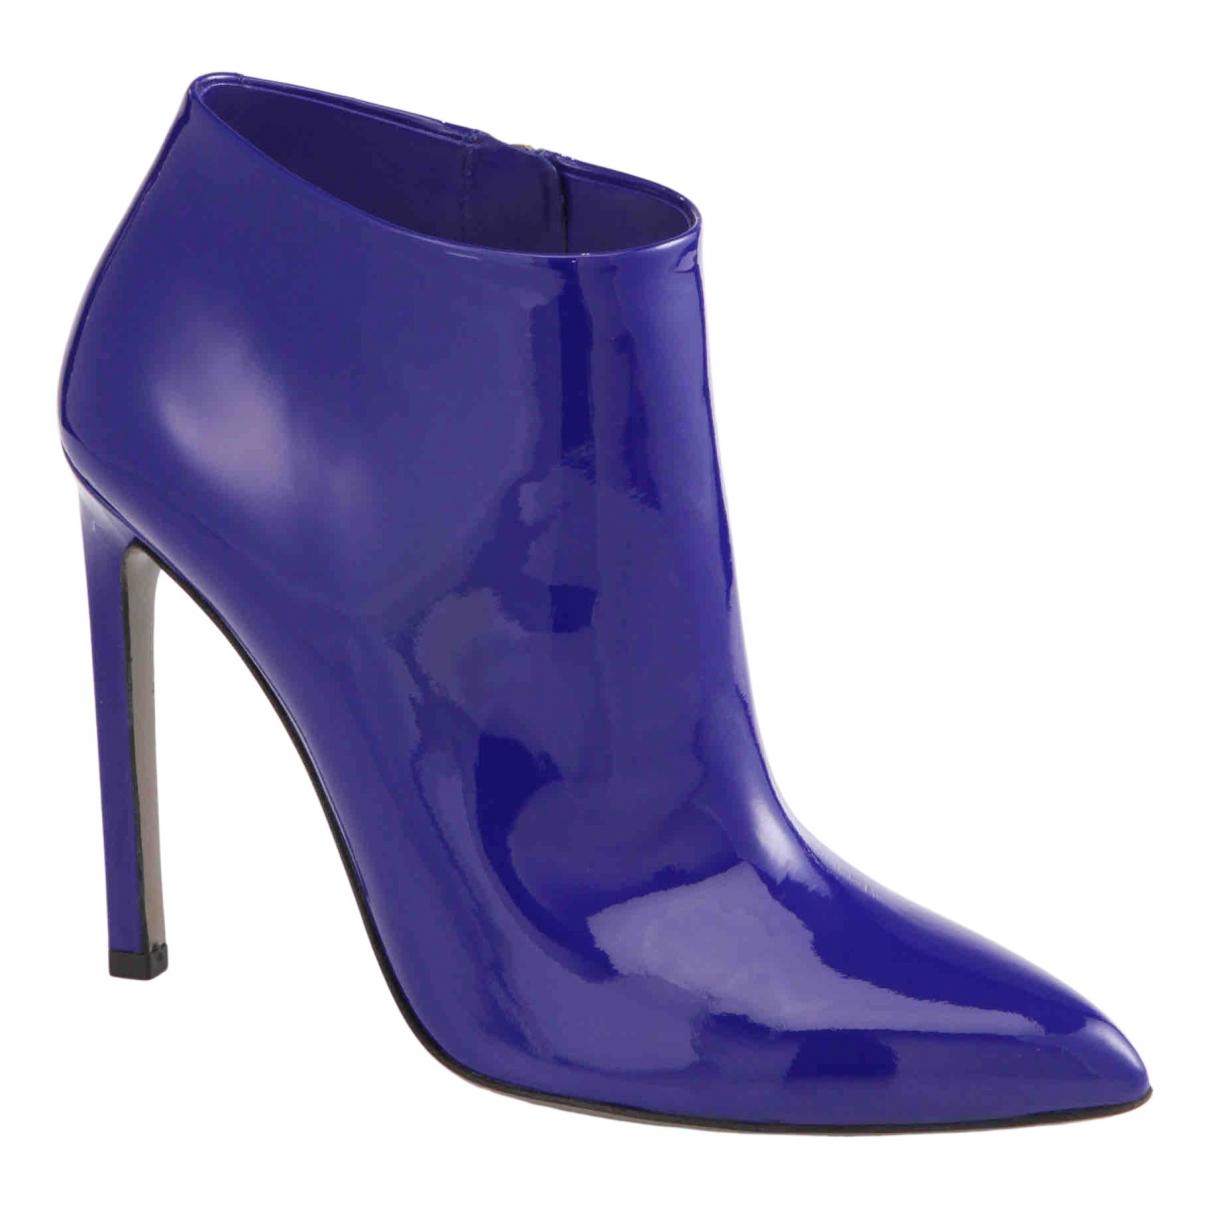 Gucci \N Stiefeletten in  Blau Lackleder